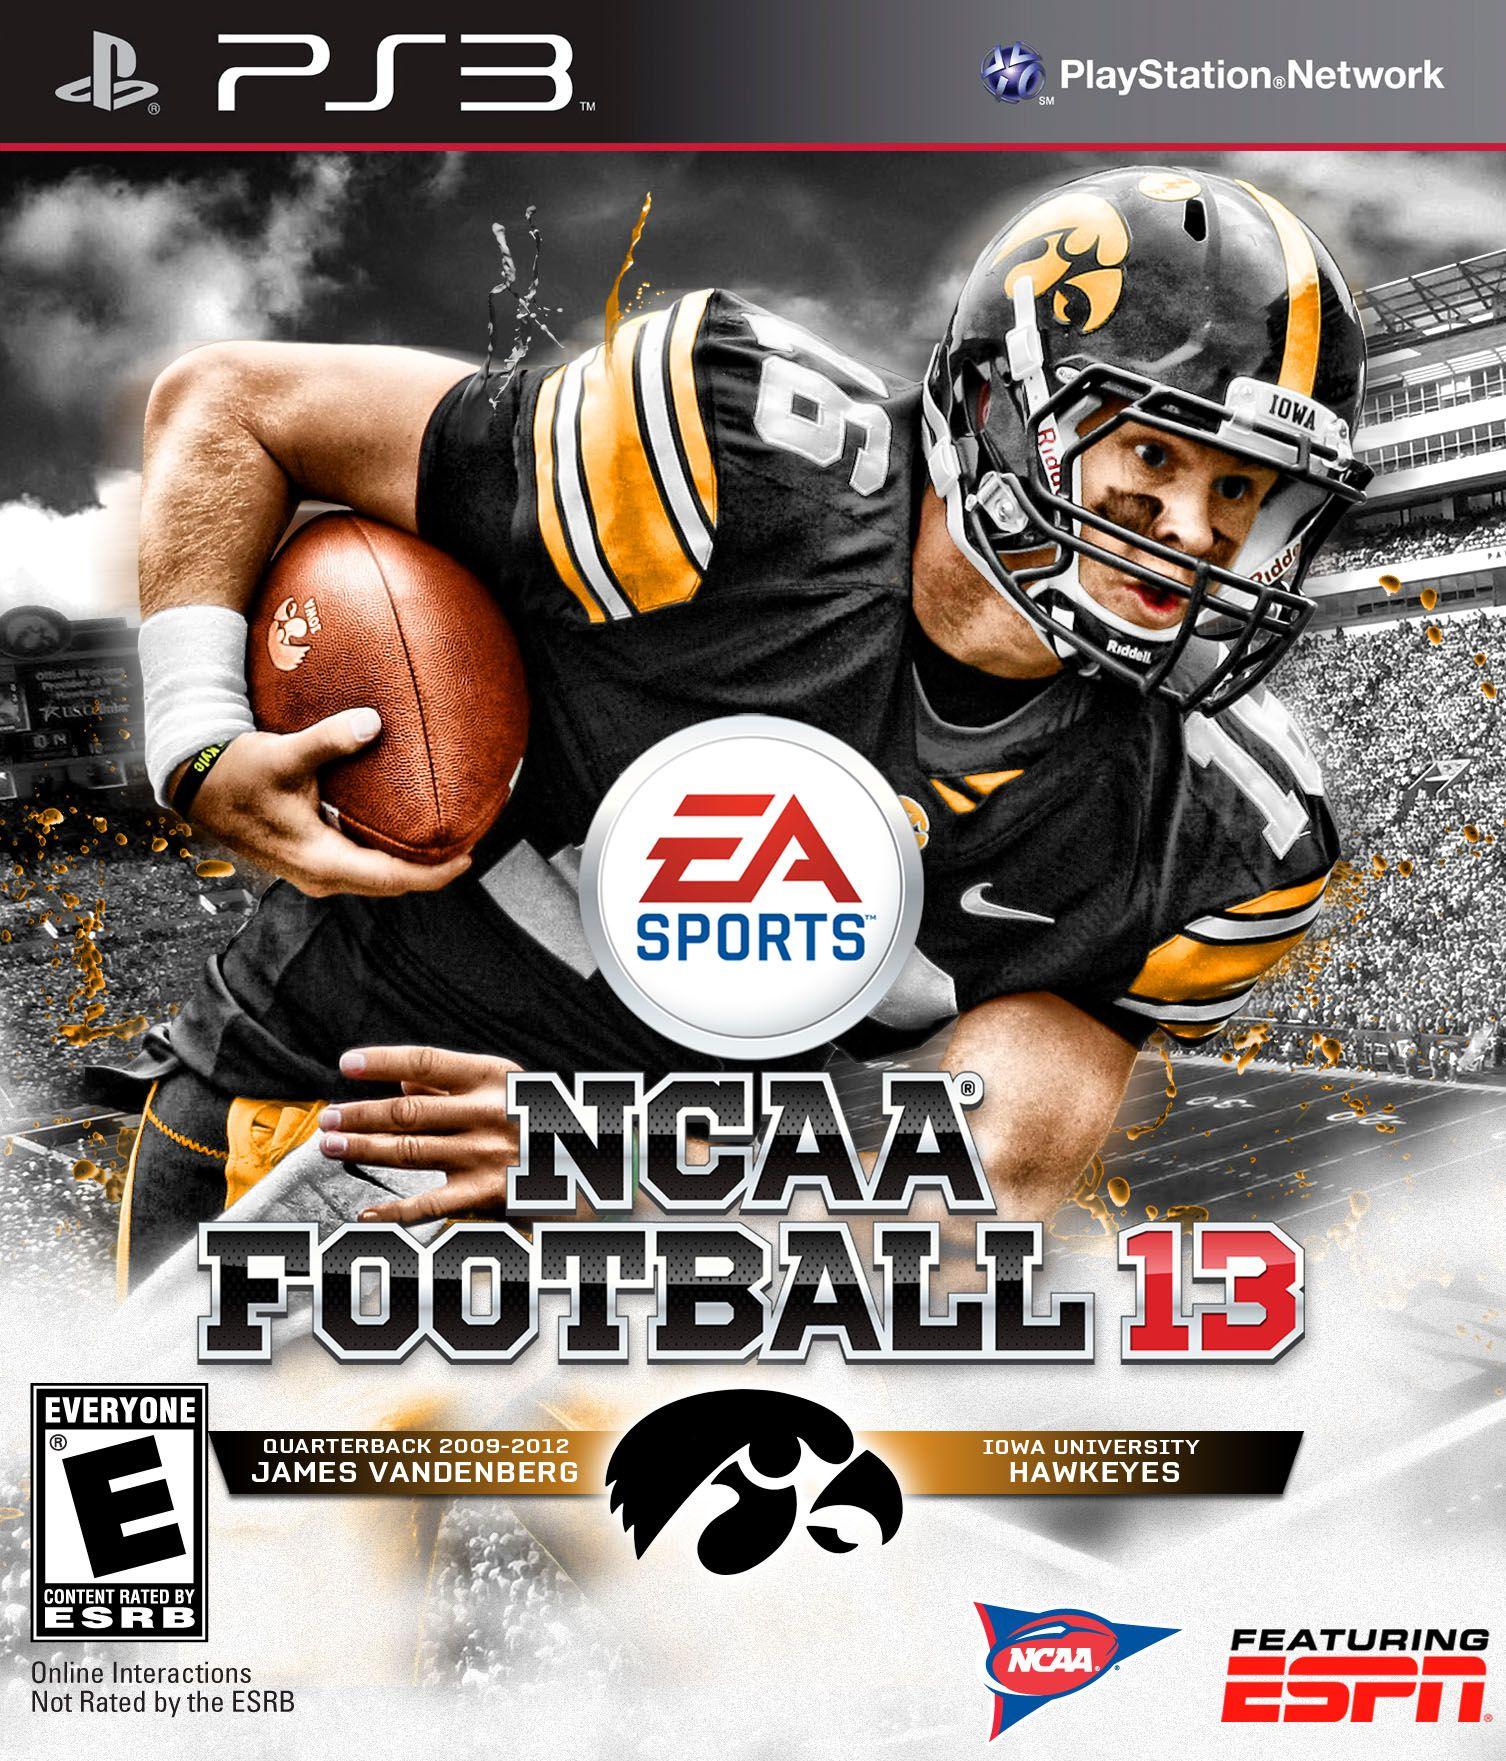 James Vendenburg Iowa Hawkeyes Iowa Hawkeye Football Hawkeye